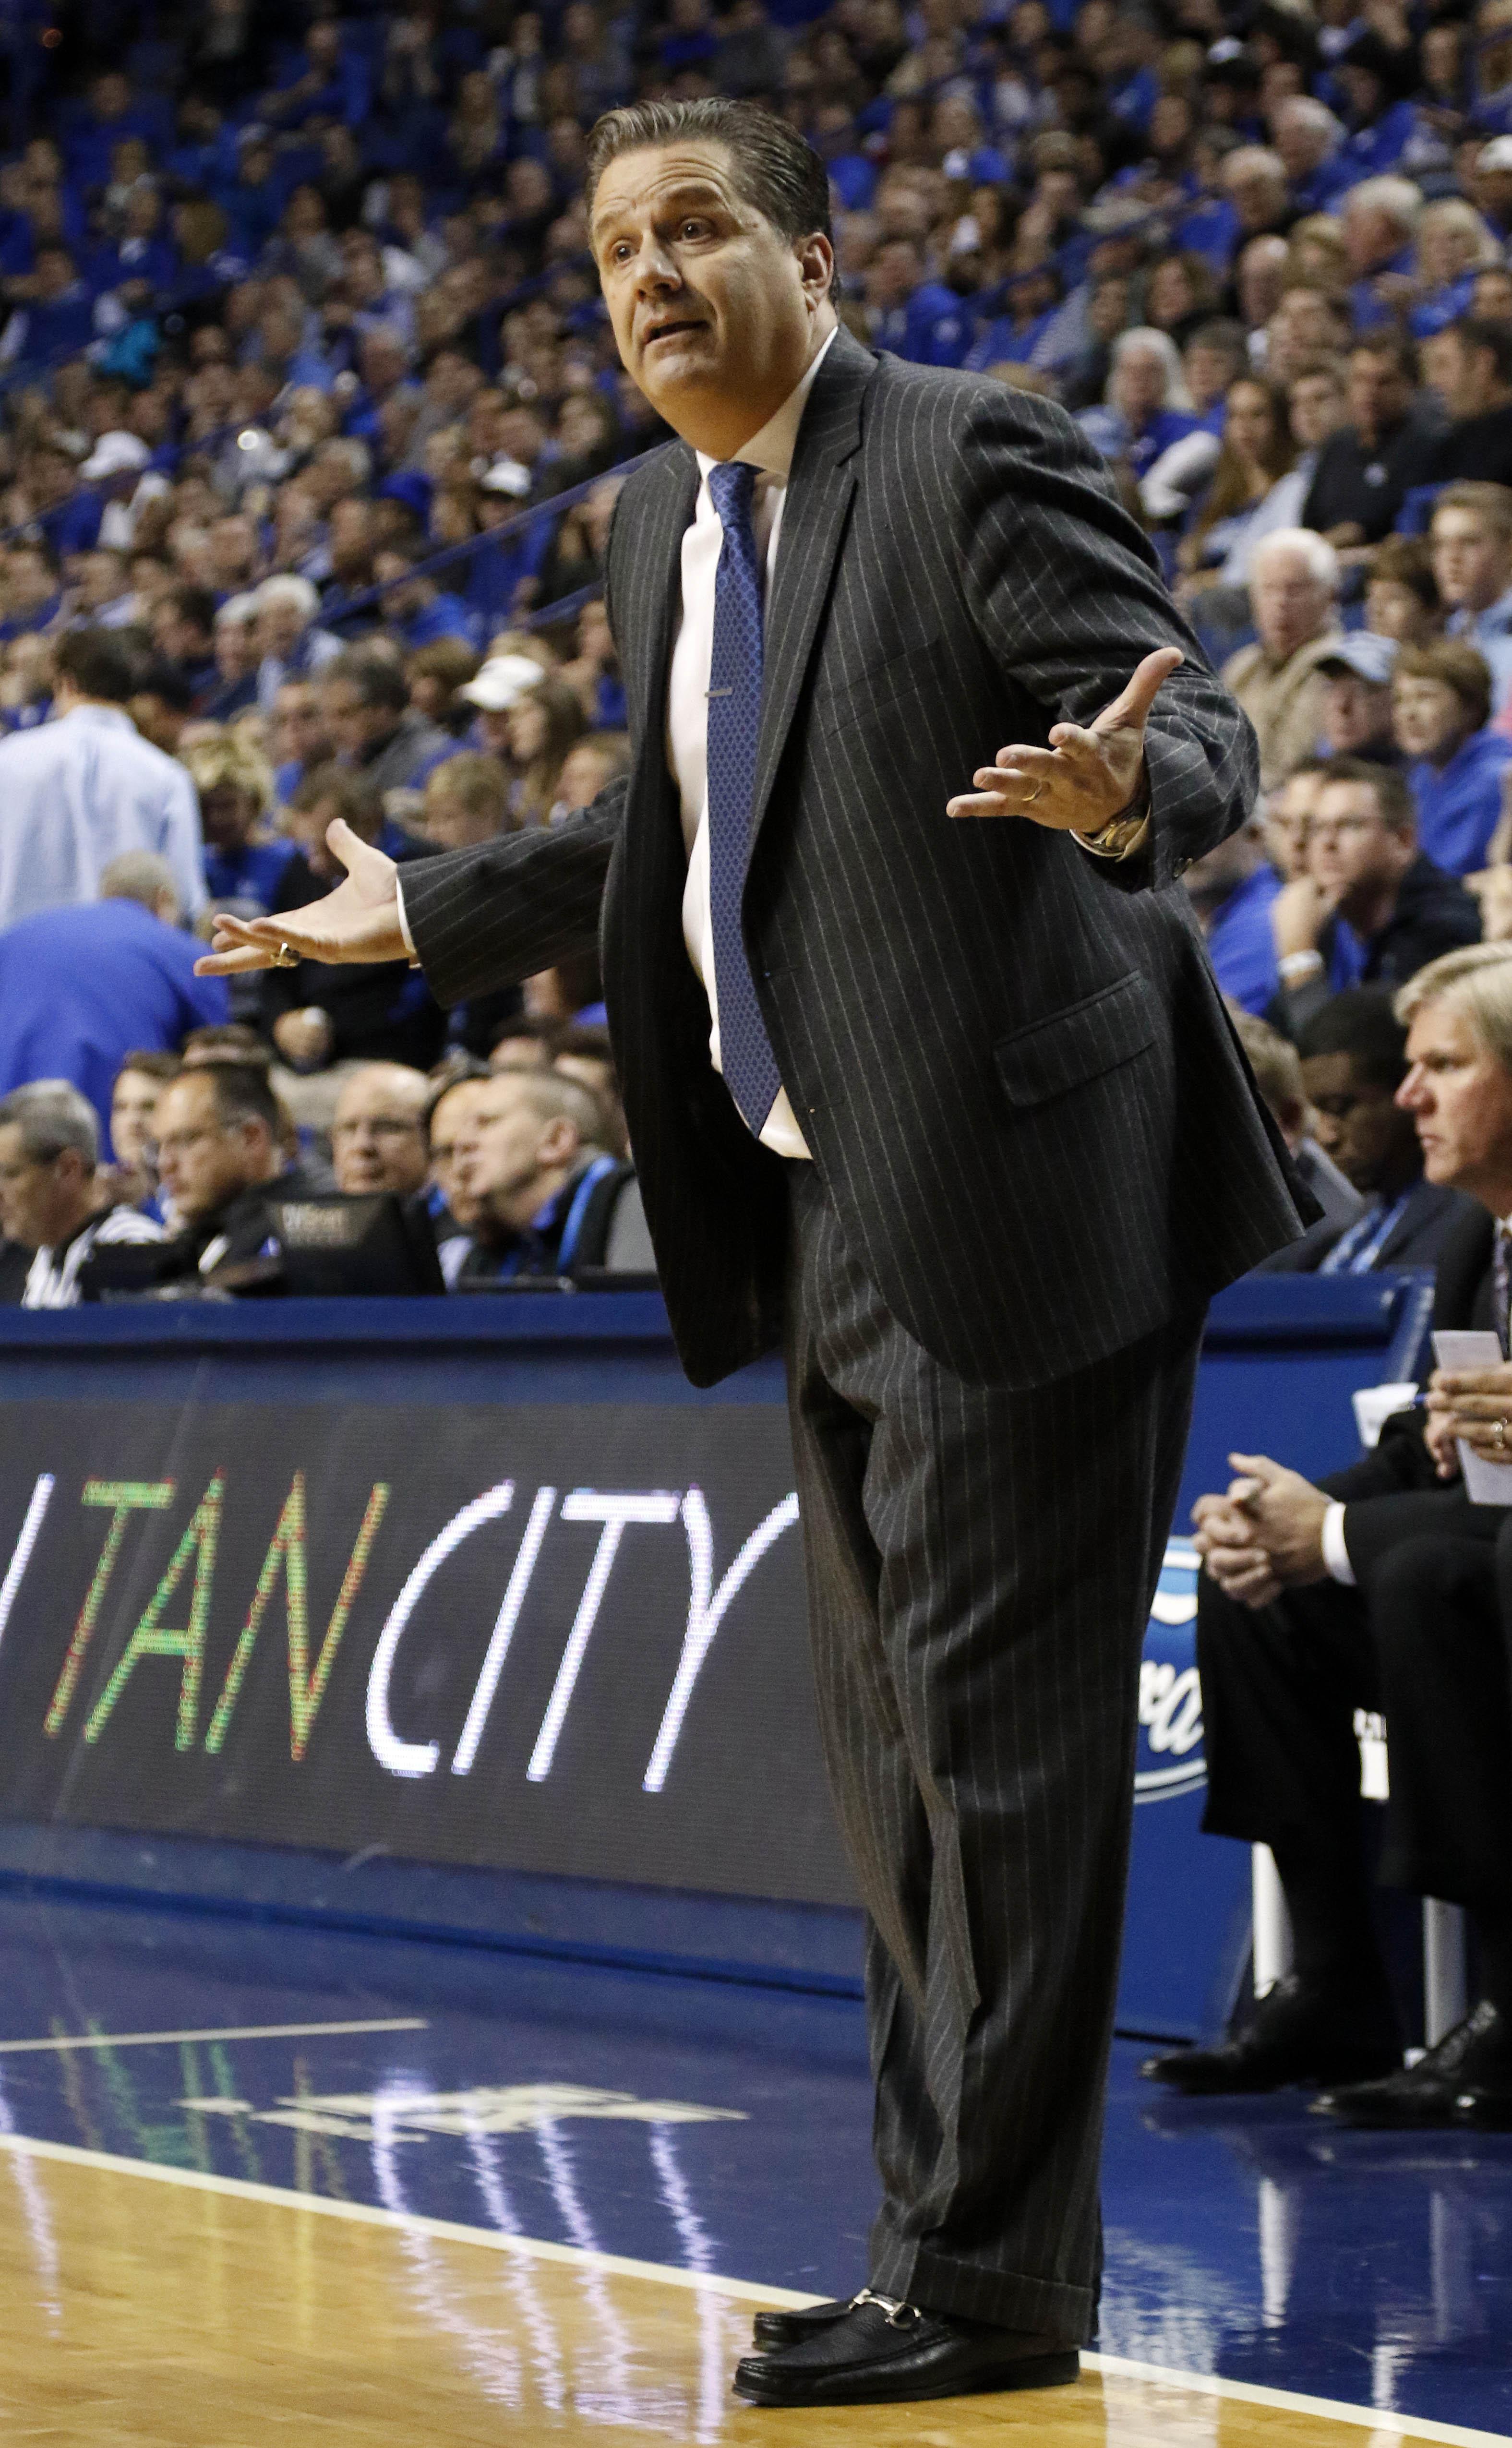 Kentucky head coach John Calipari questions a player during the second half of an NCAA college basketball game against Boston University Tuesday, Nov. 24, 2015, in Lexington, Ky. Kentucky won 82-62. (AP Photo/James Crisp)